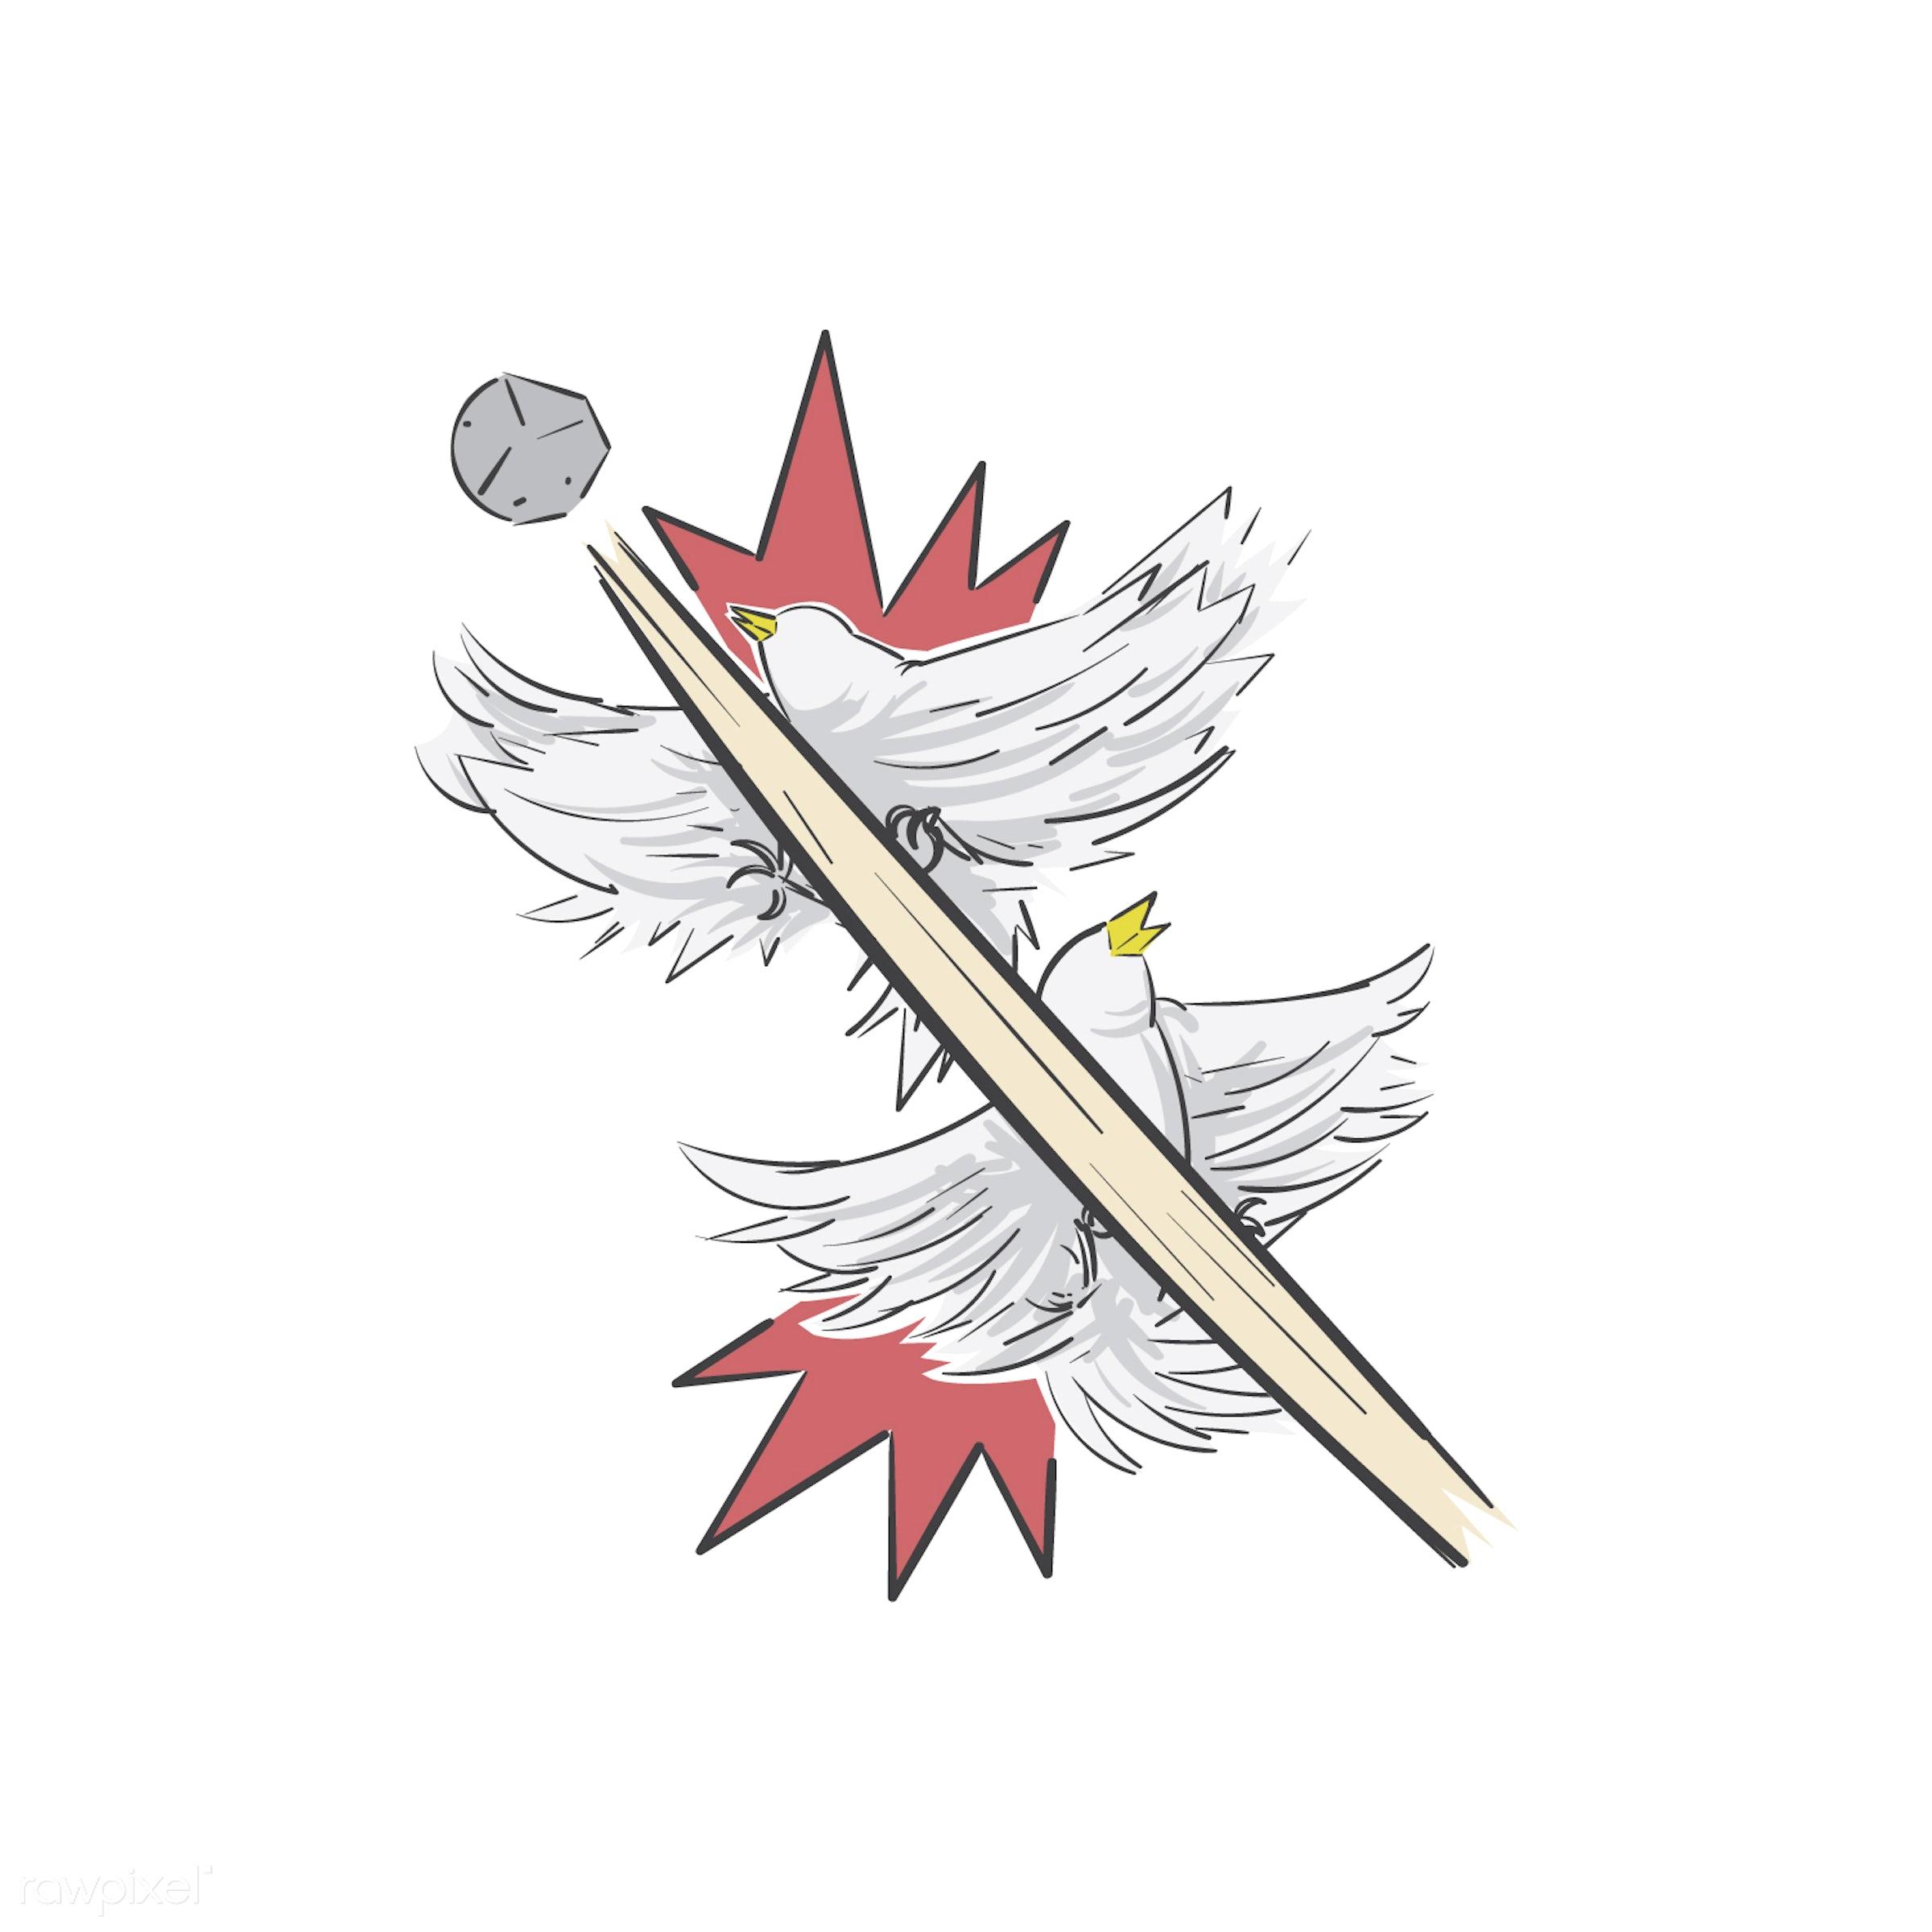 Kill two birds with one stone idiom vector - achievement, affective, art, benefits, birds, creative, creativity, design,...